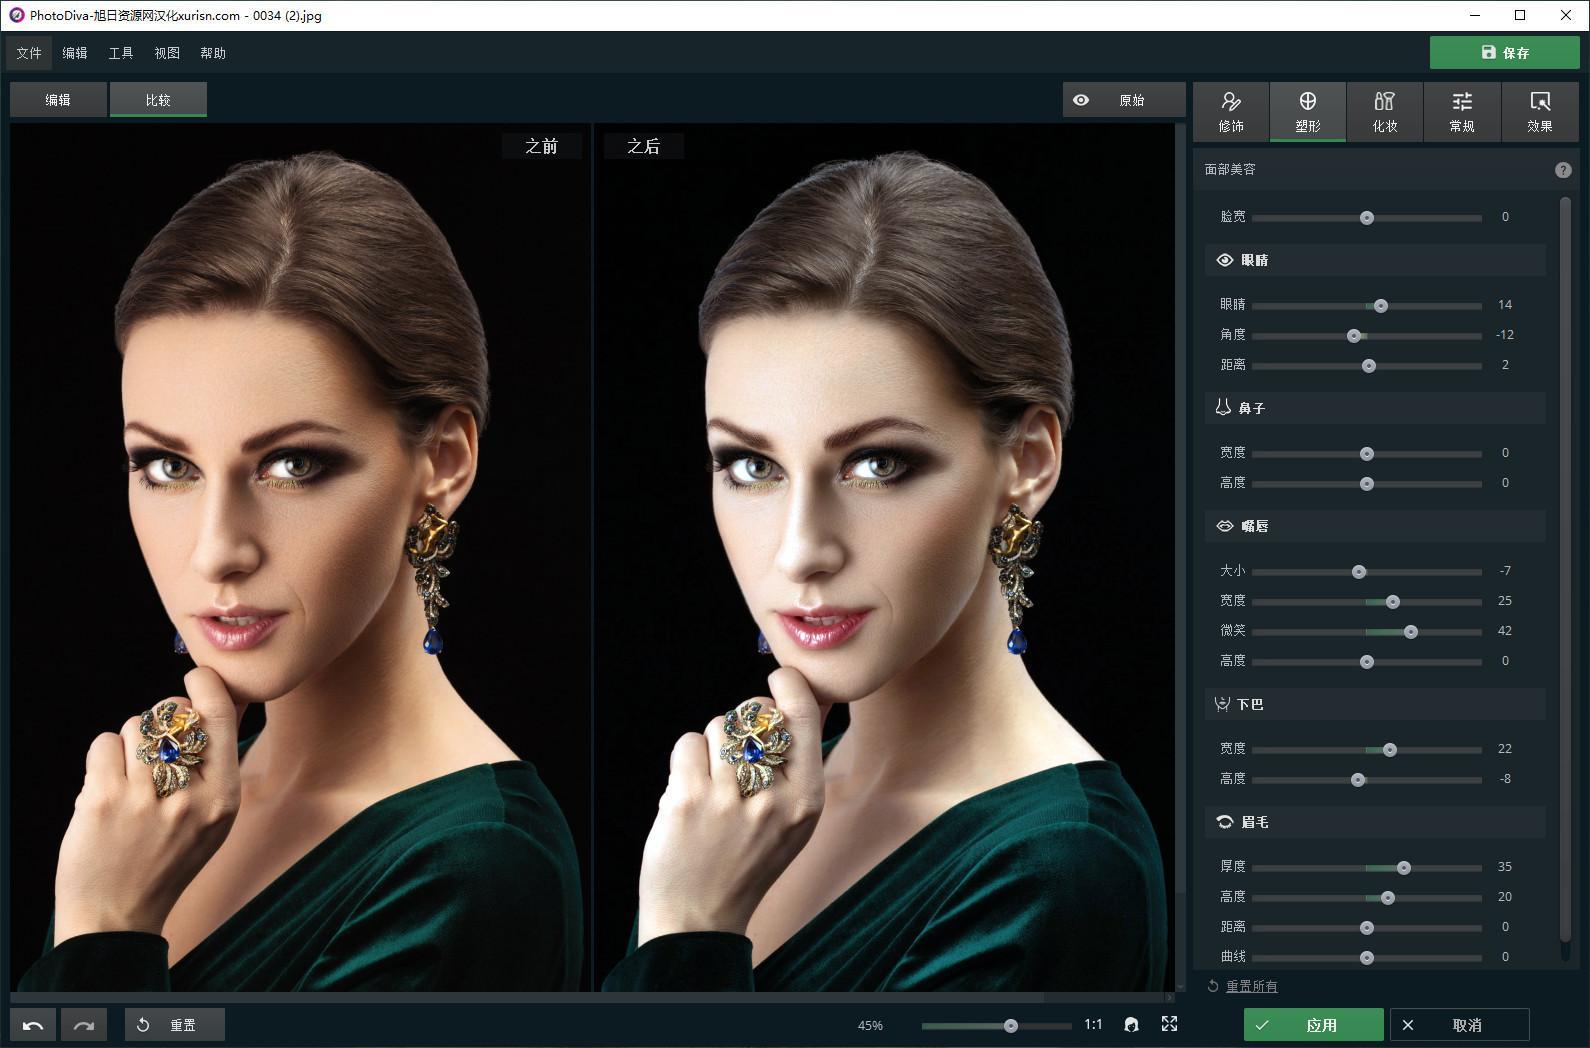 VIP资源-PhotoDiva Pro 3.0汉化版 快捷人像美容塑形修肤化妆照片编辑器(5)